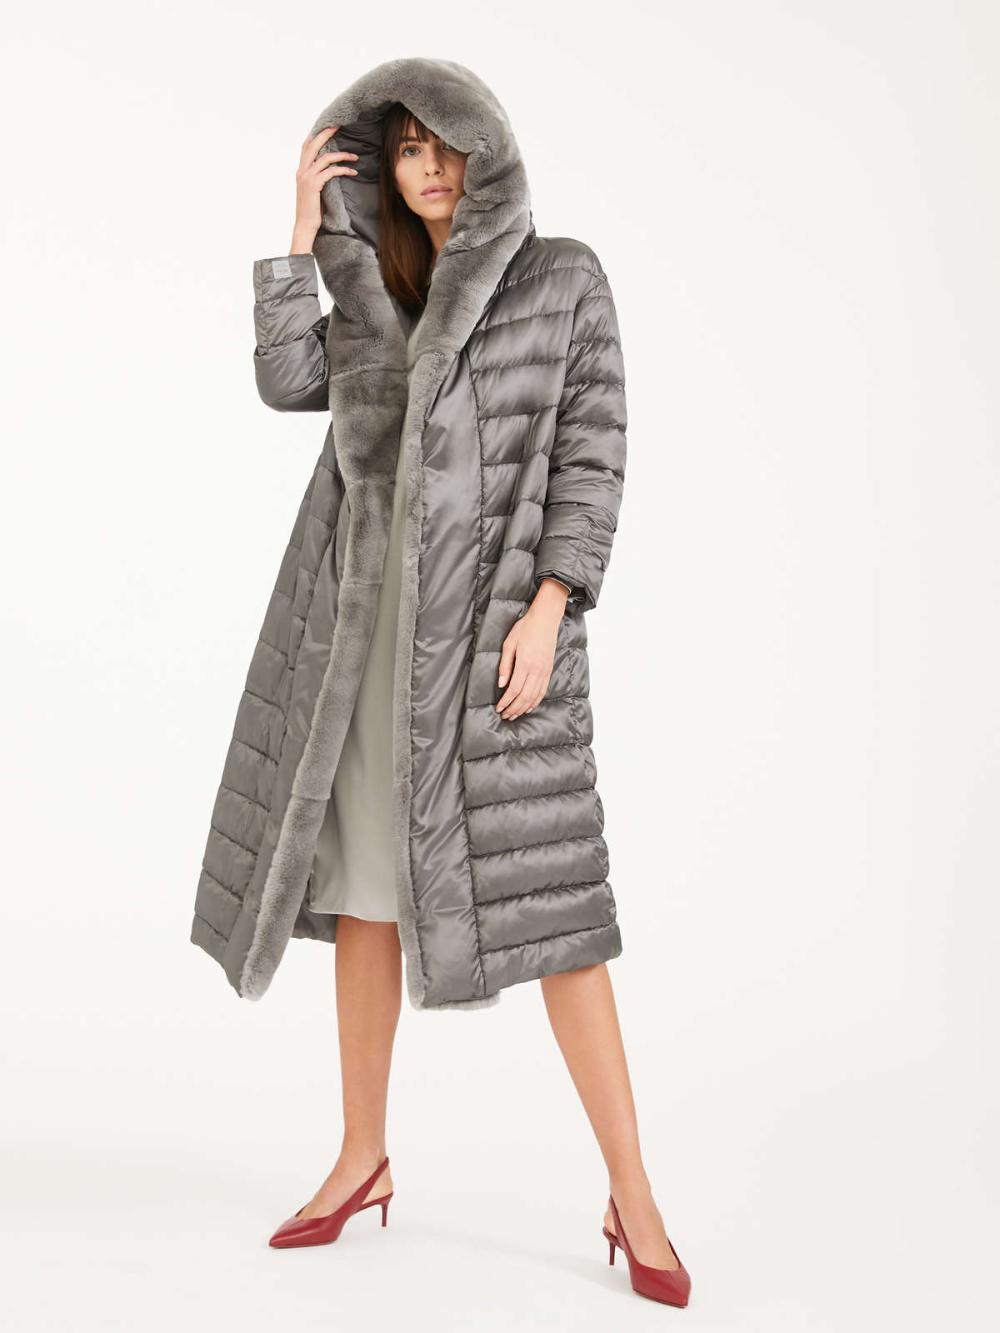 Reversible Down Coat In Water Repellent Satin Medium Grey Novelap Max Mara Down Coat Coat Water Repellent [ 1333 x 1000 Pixel ]